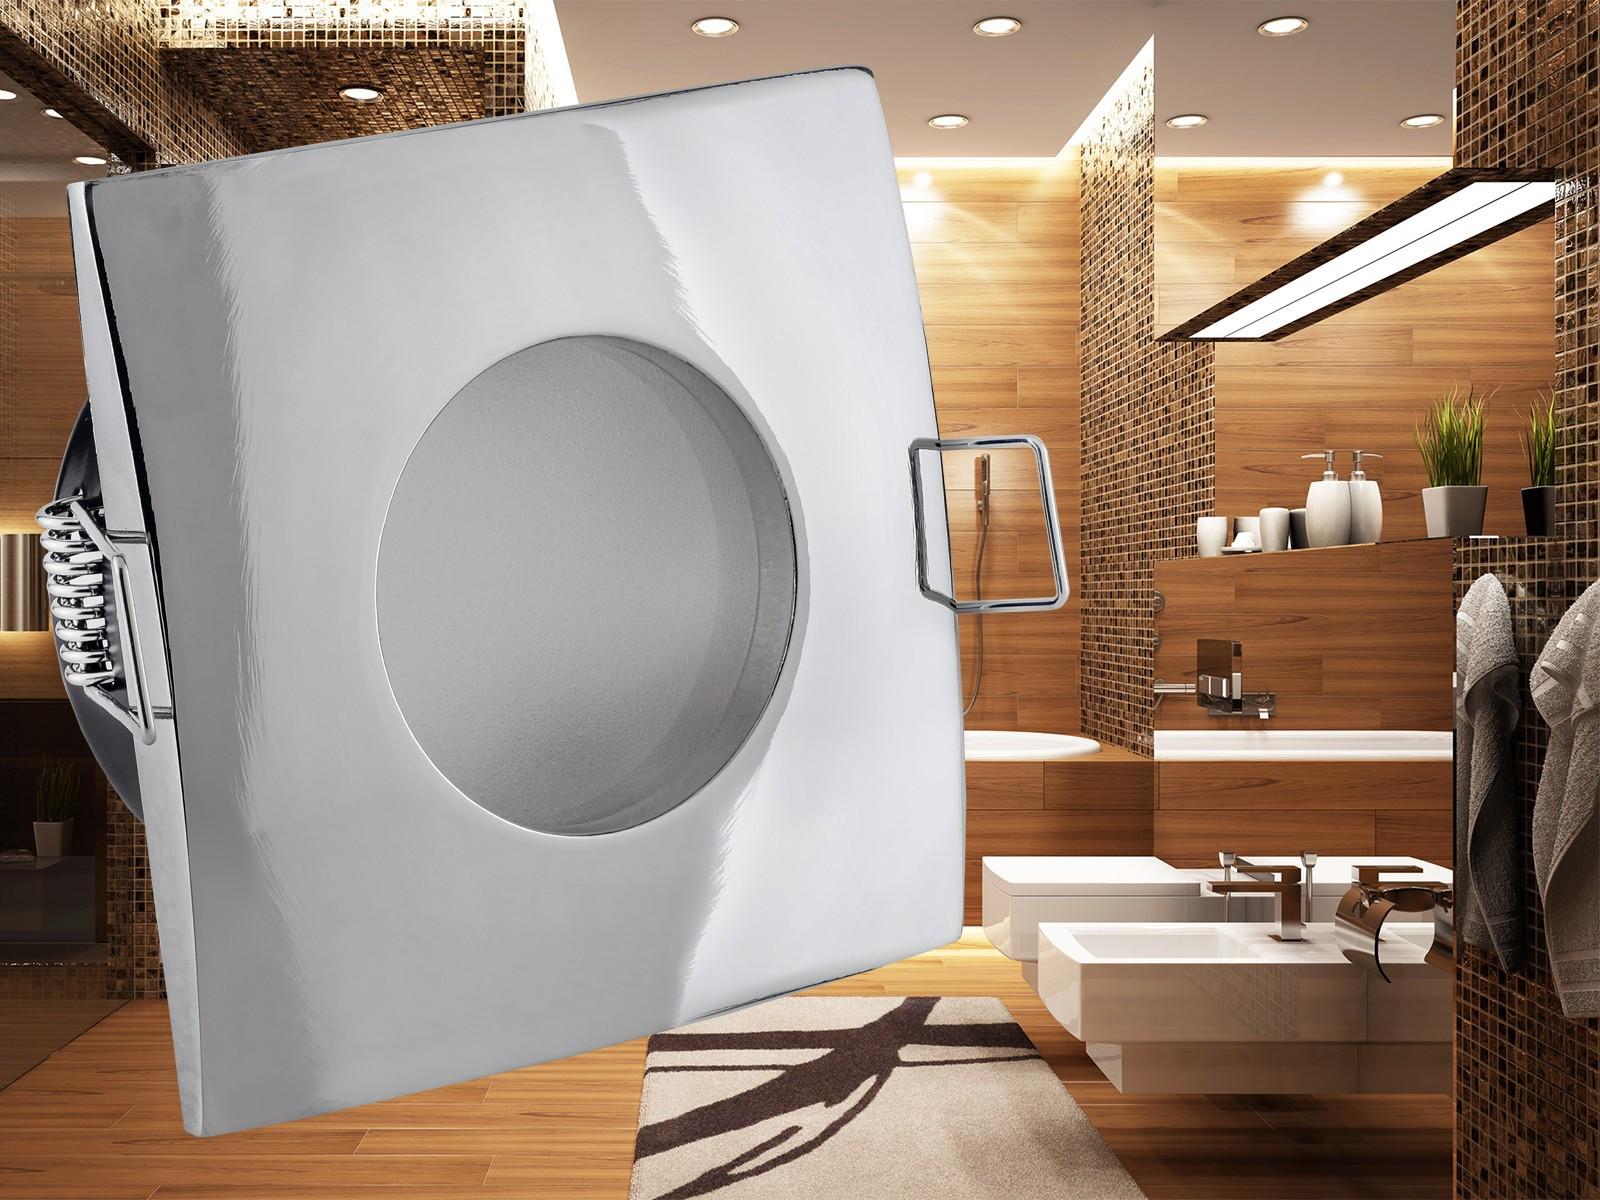 led strahler in der dusche raum und m beldesign inspiration. Black Bedroom Furniture Sets. Home Design Ideas